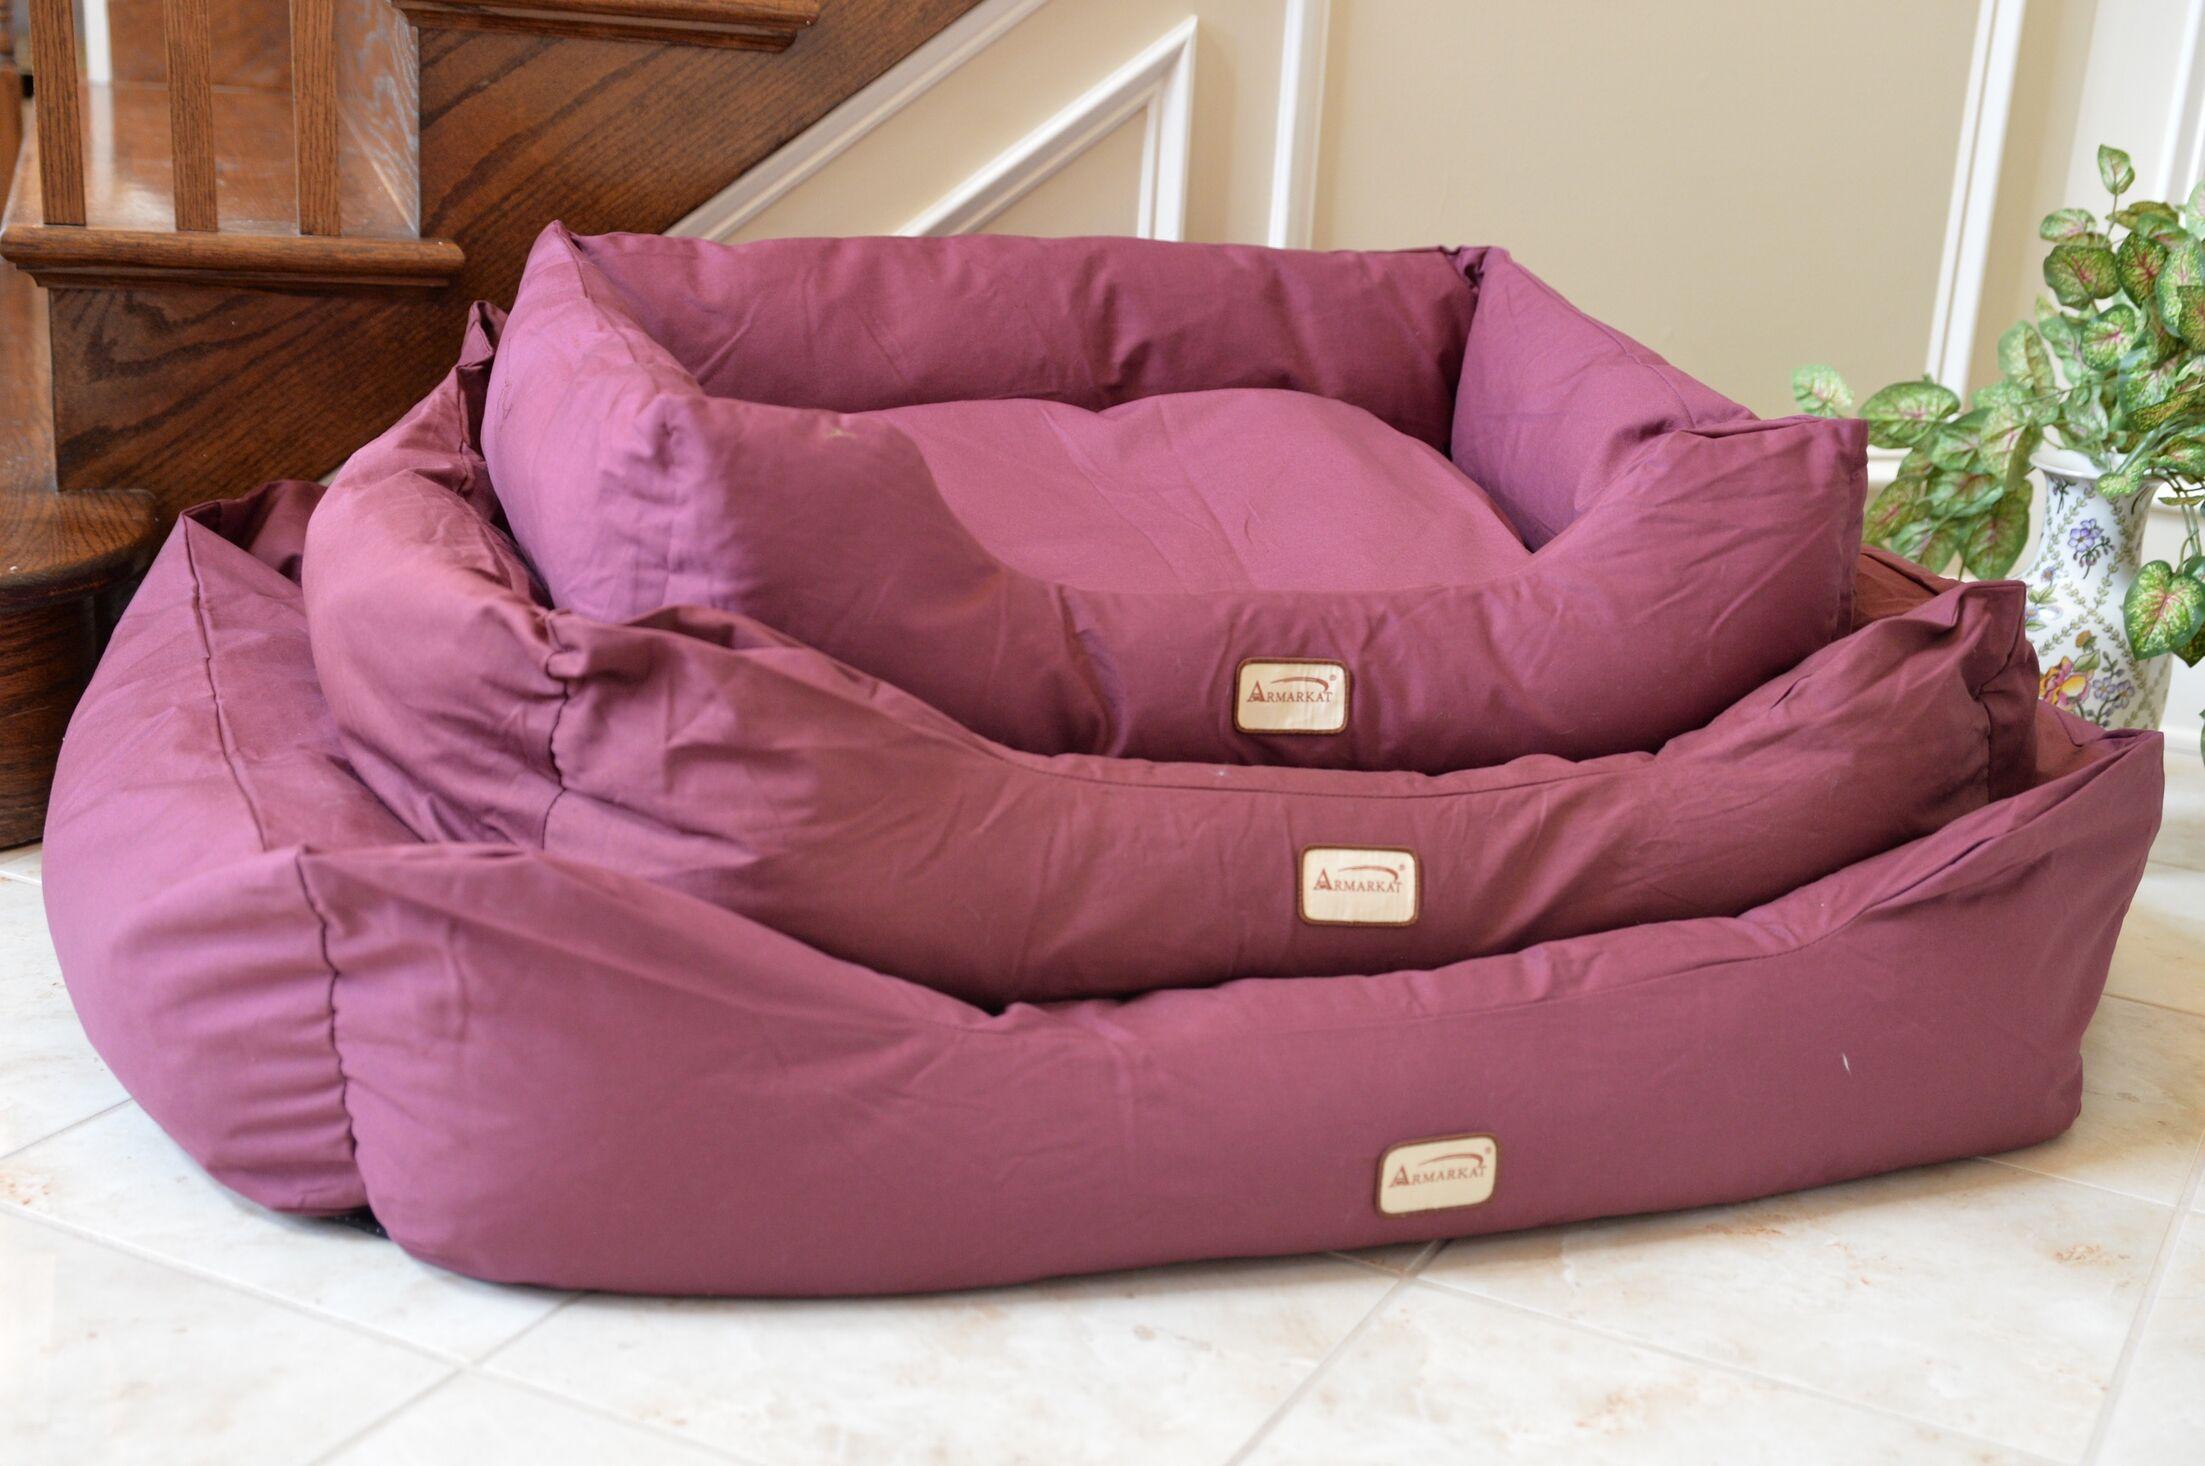 Bolster Dog Bed Size: Large (43